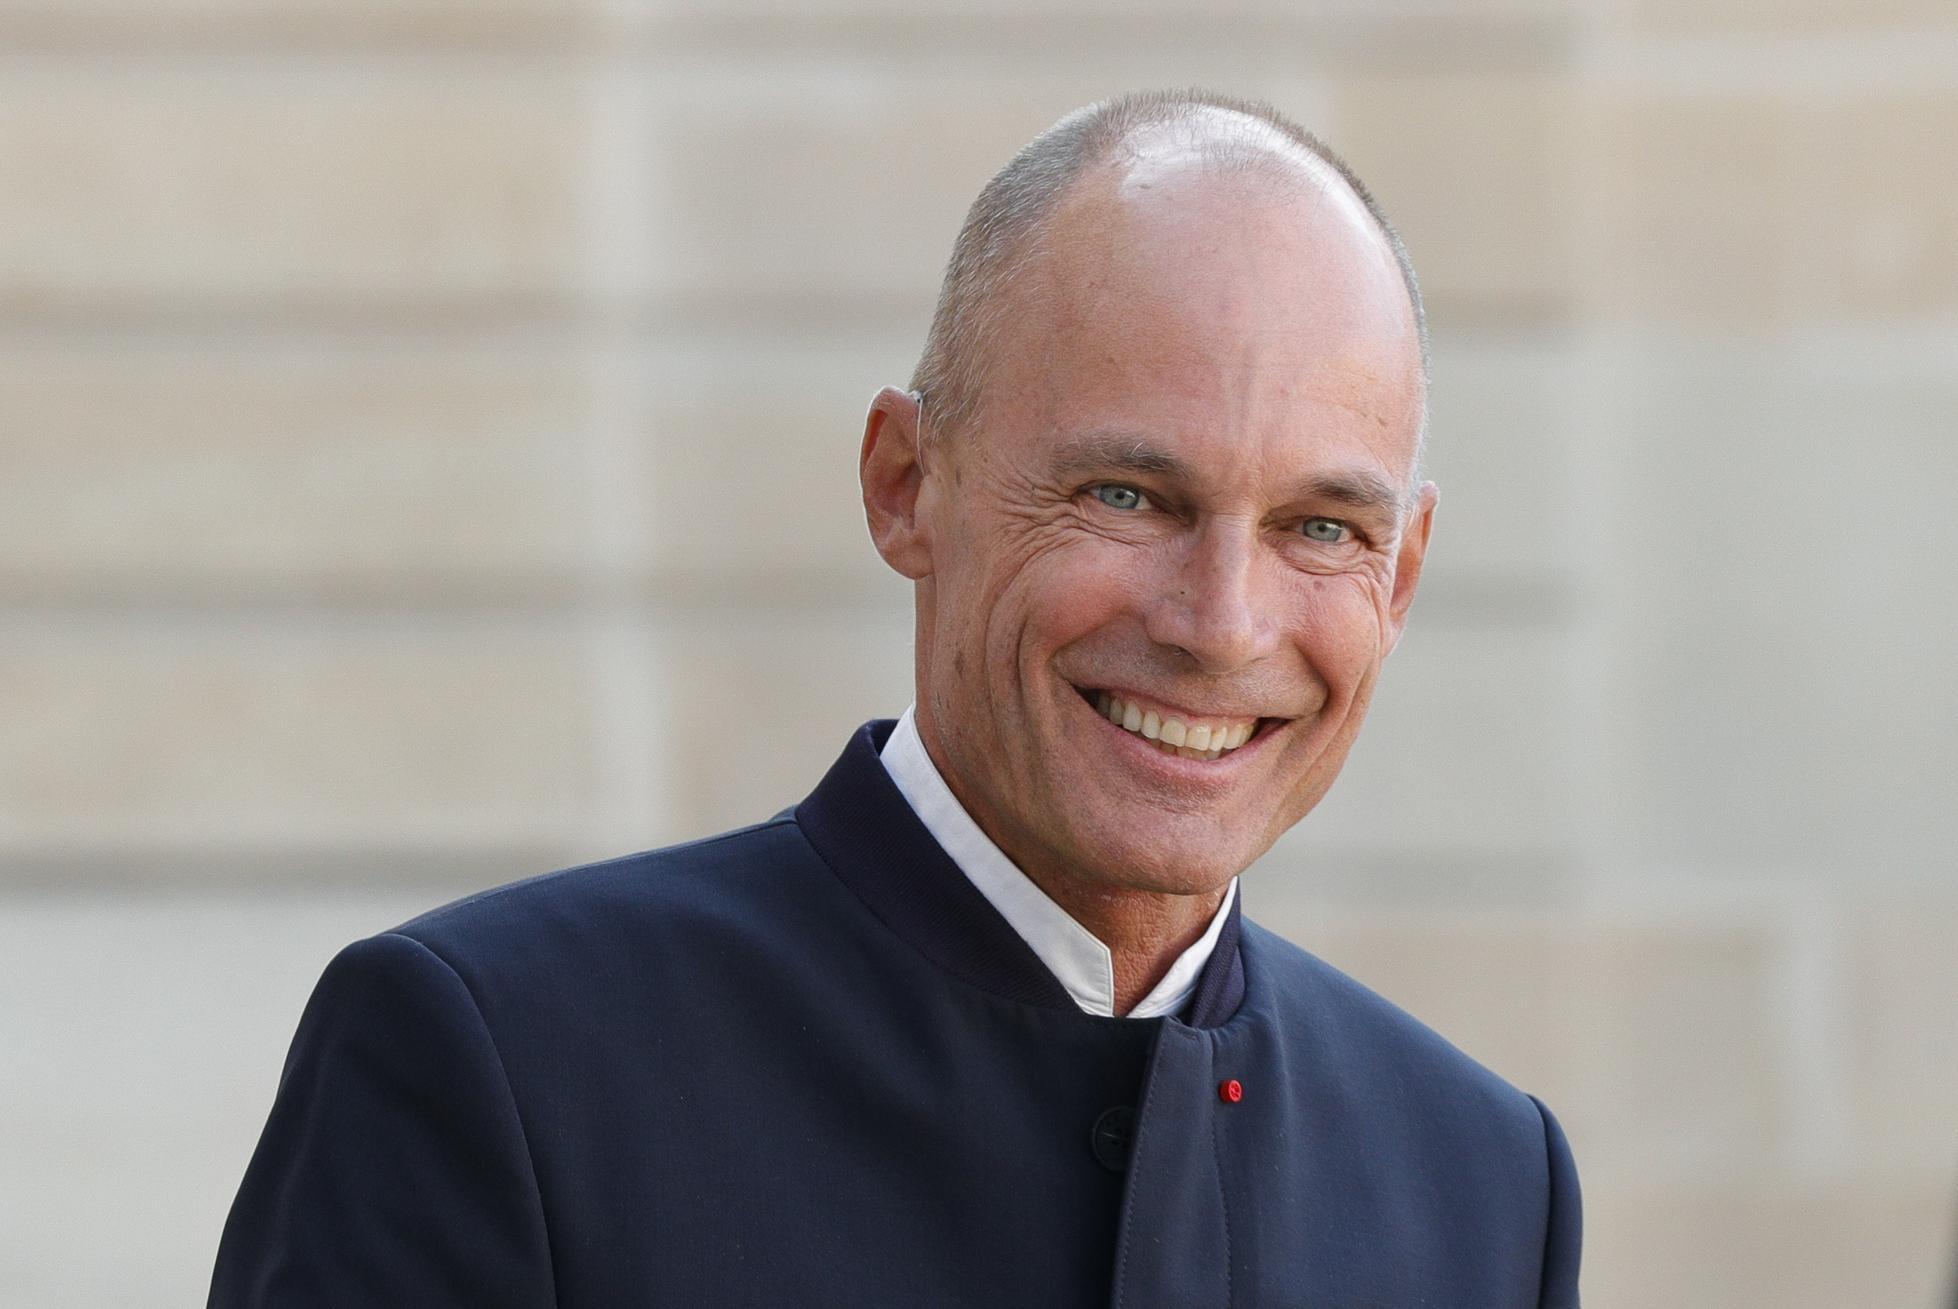 Swiss aeronaut, and chair of the Solar Impulse Foundation Bertrand Piccard.